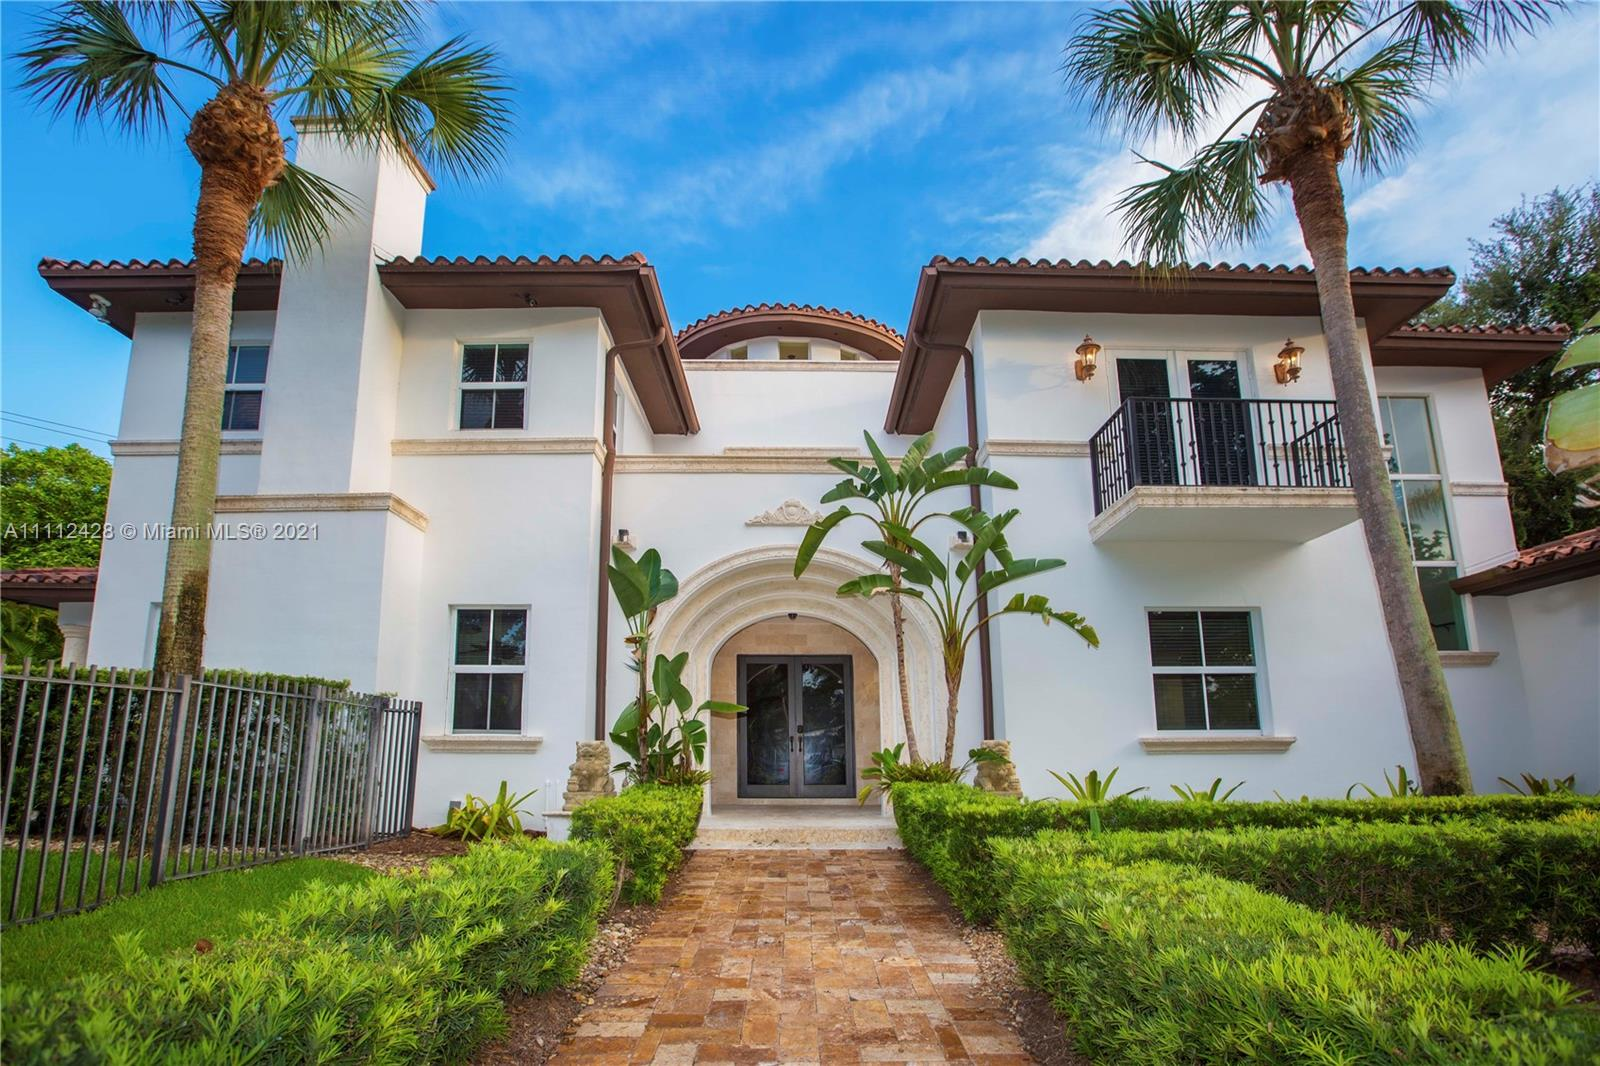 Single Family Home,For Sale,500 Santurce Ave, Coral Gables, Florida 33143,Brickell,realty,broker,condos near me